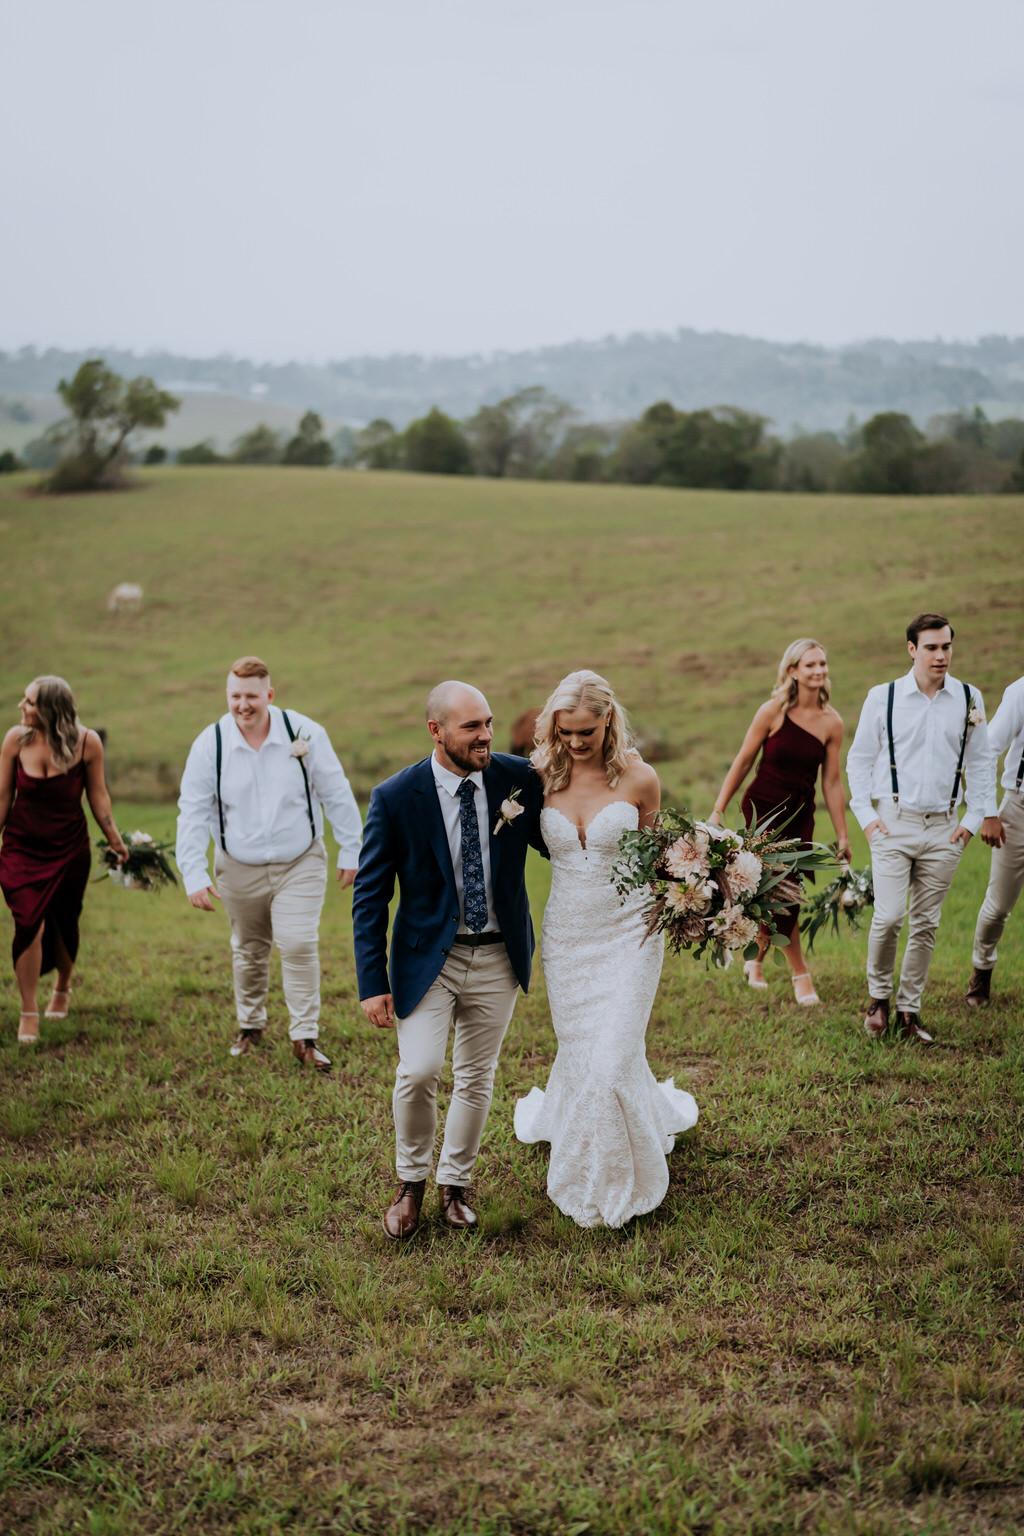 ava-me-photography-jade-simon-loxley-bellbird-hill-kurrajong-heights-wedding-655